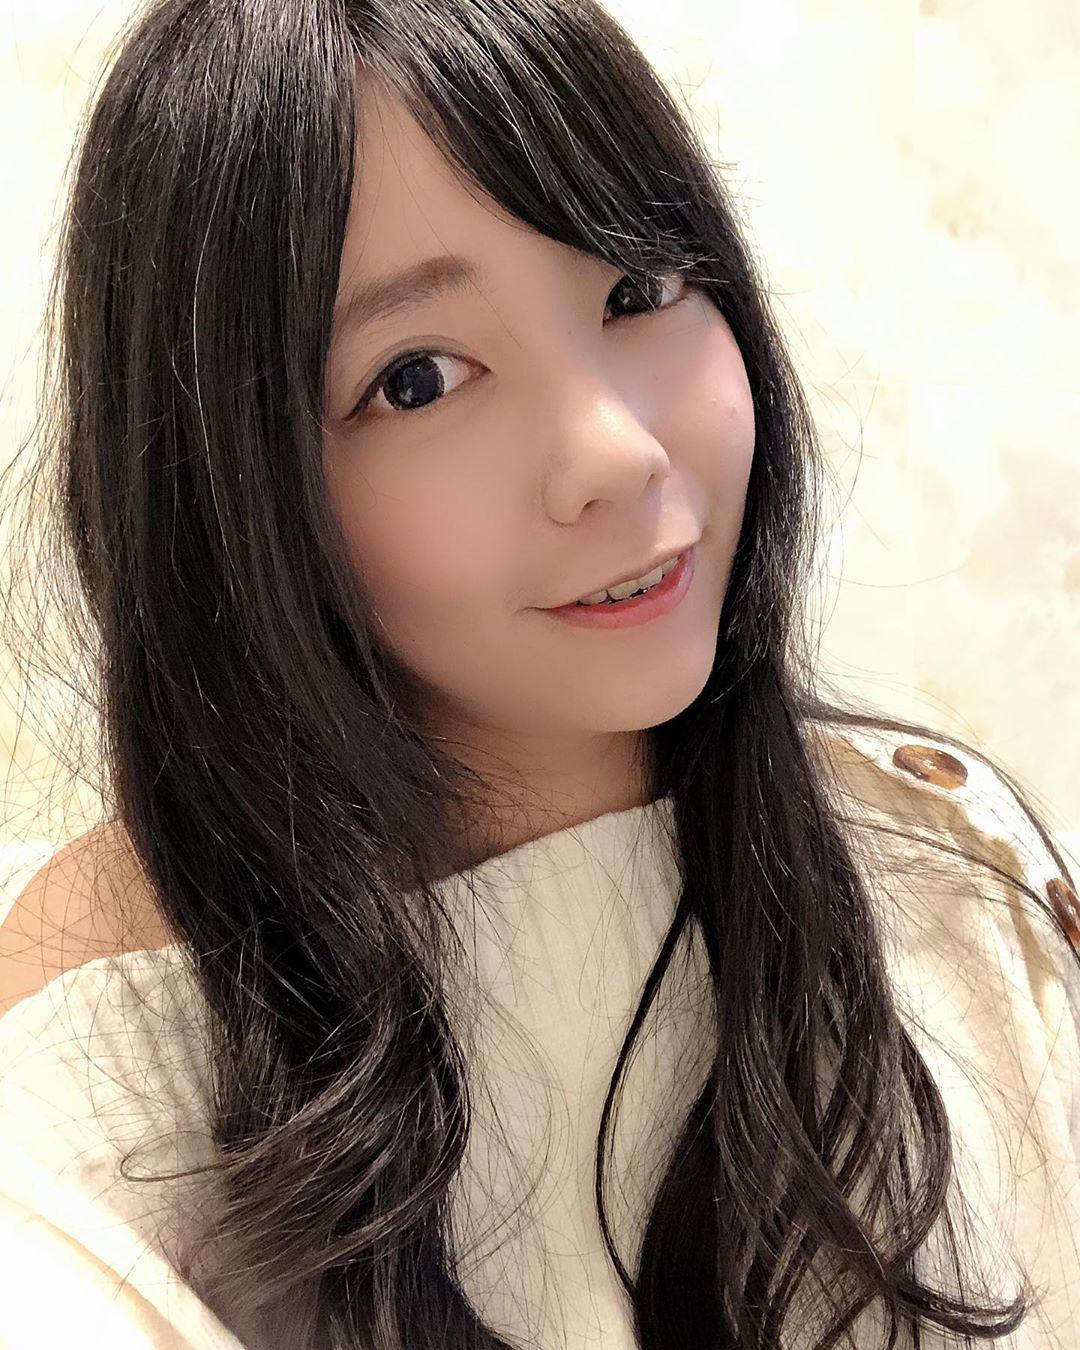 Tsuki月希  迷人電眼一看見就深深被吸引 - 美女圖 -